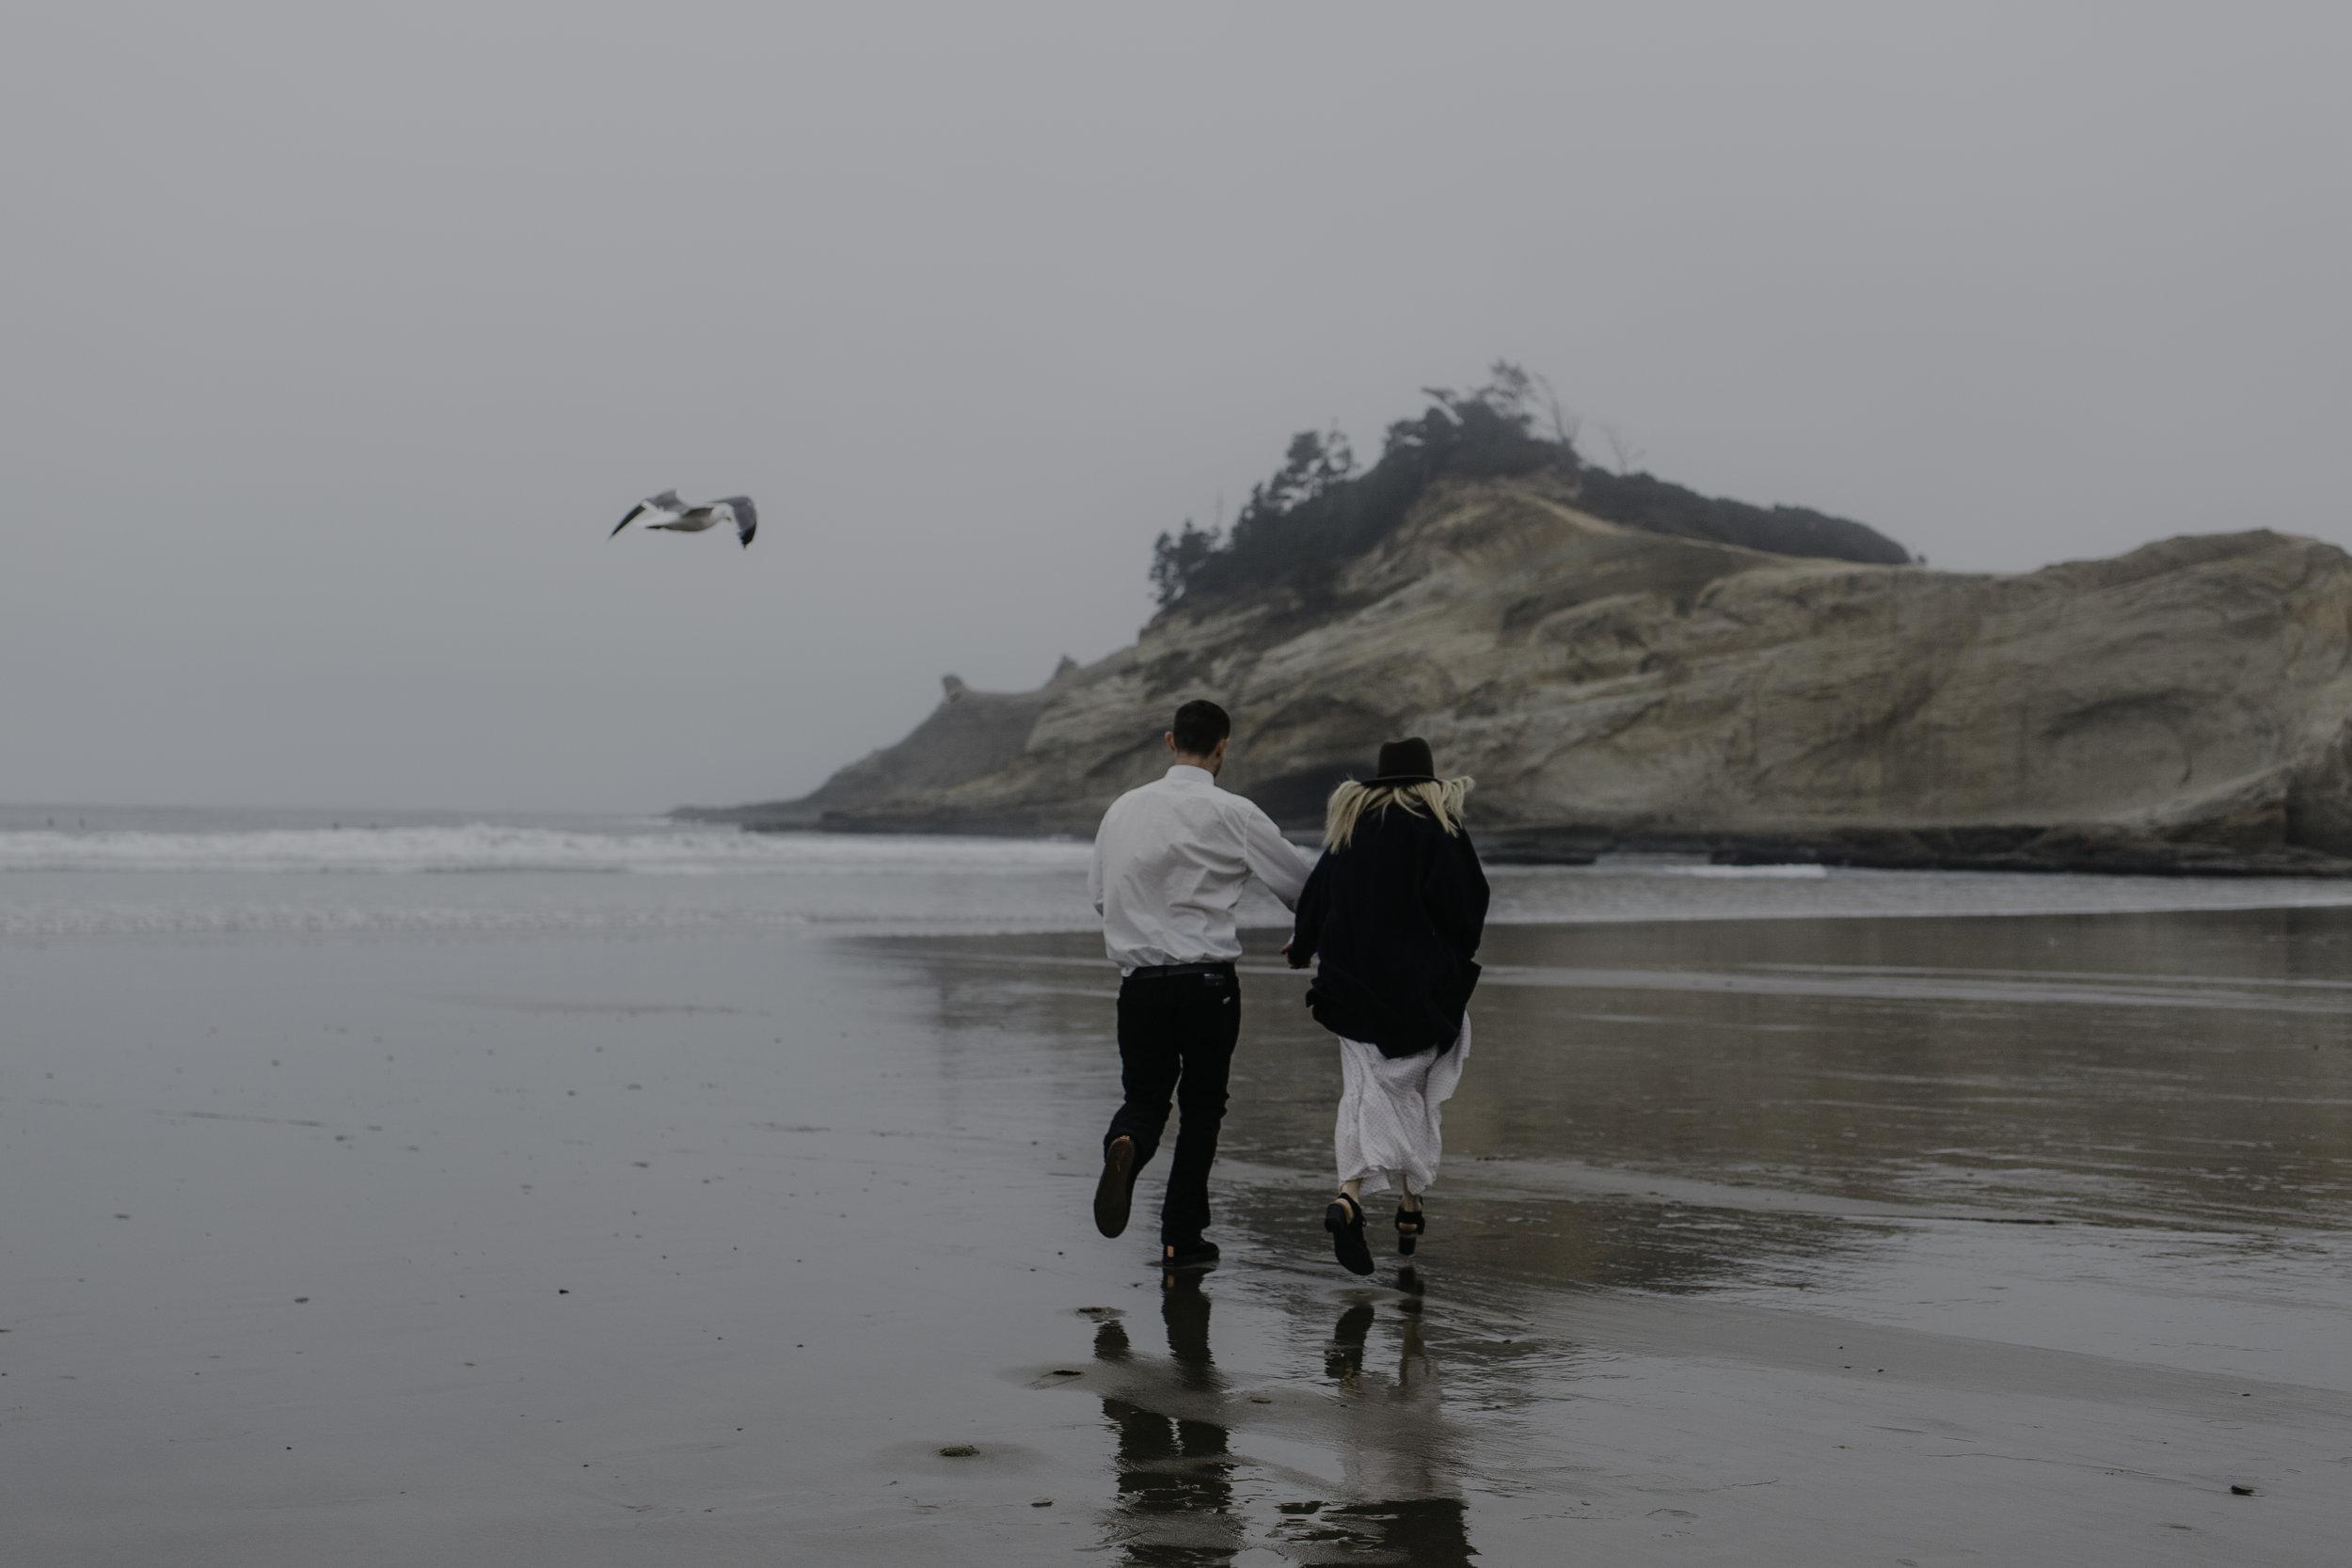 David & Becky - Cape Kiwanda Beach, Oregon